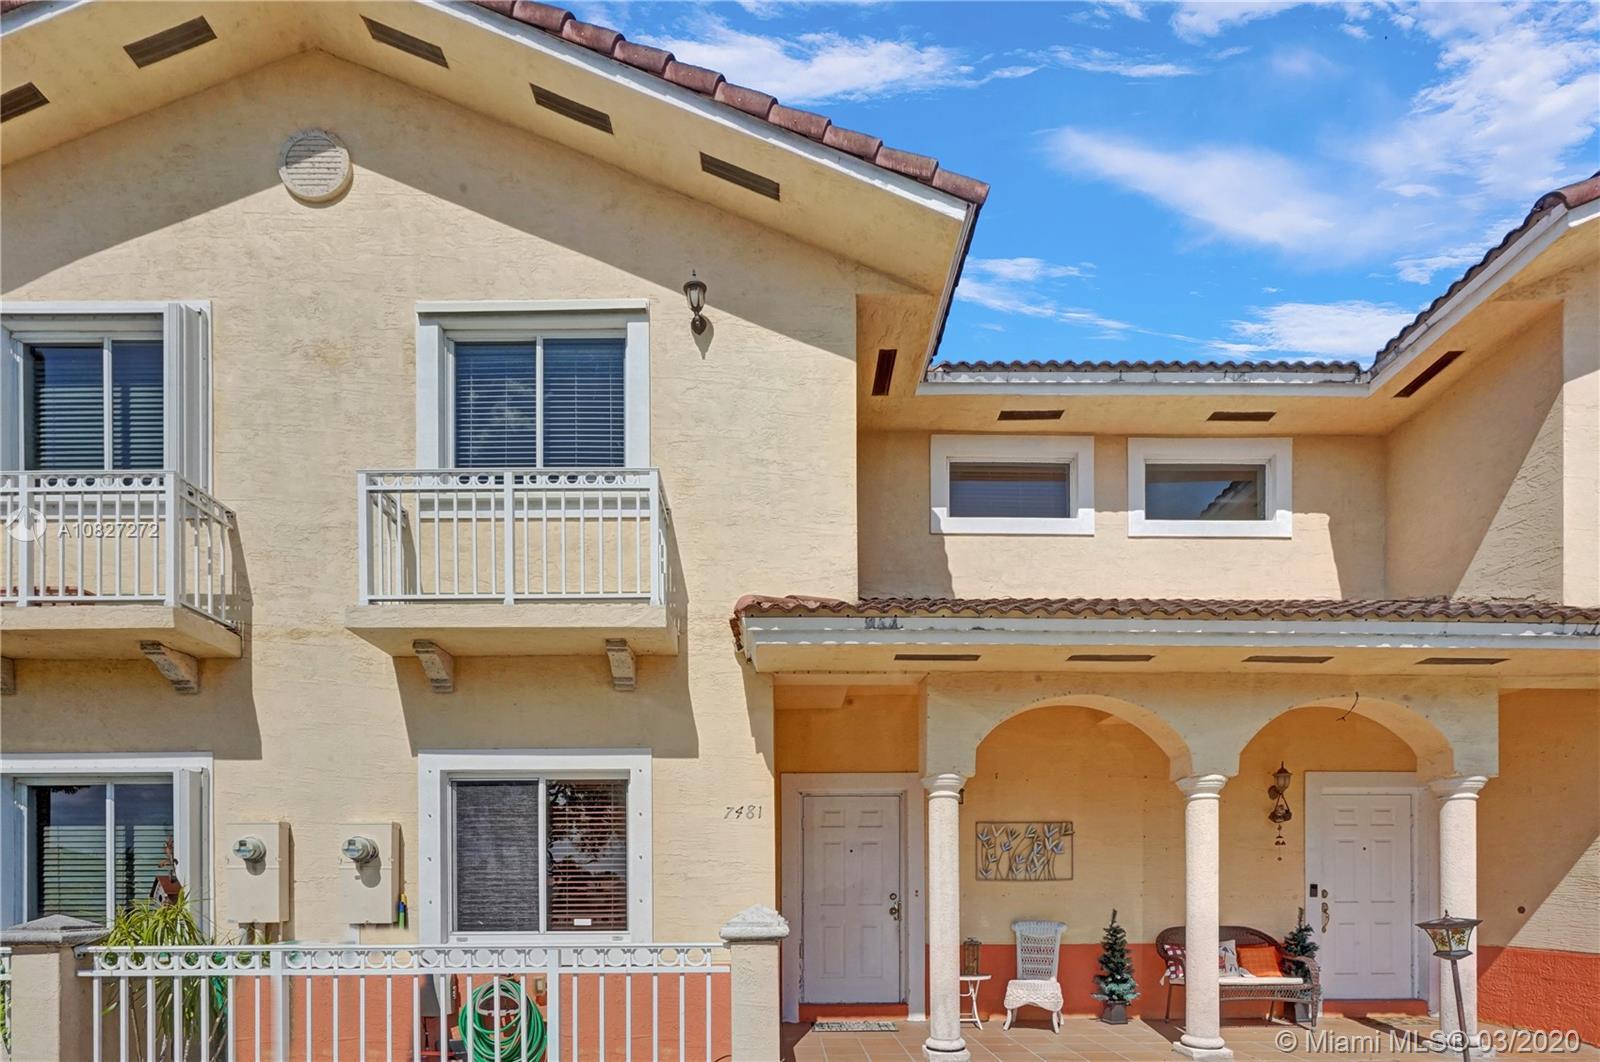 7481 NW 180th St, Hialeah, FL 33015 - Hialeah, FL real estate listing